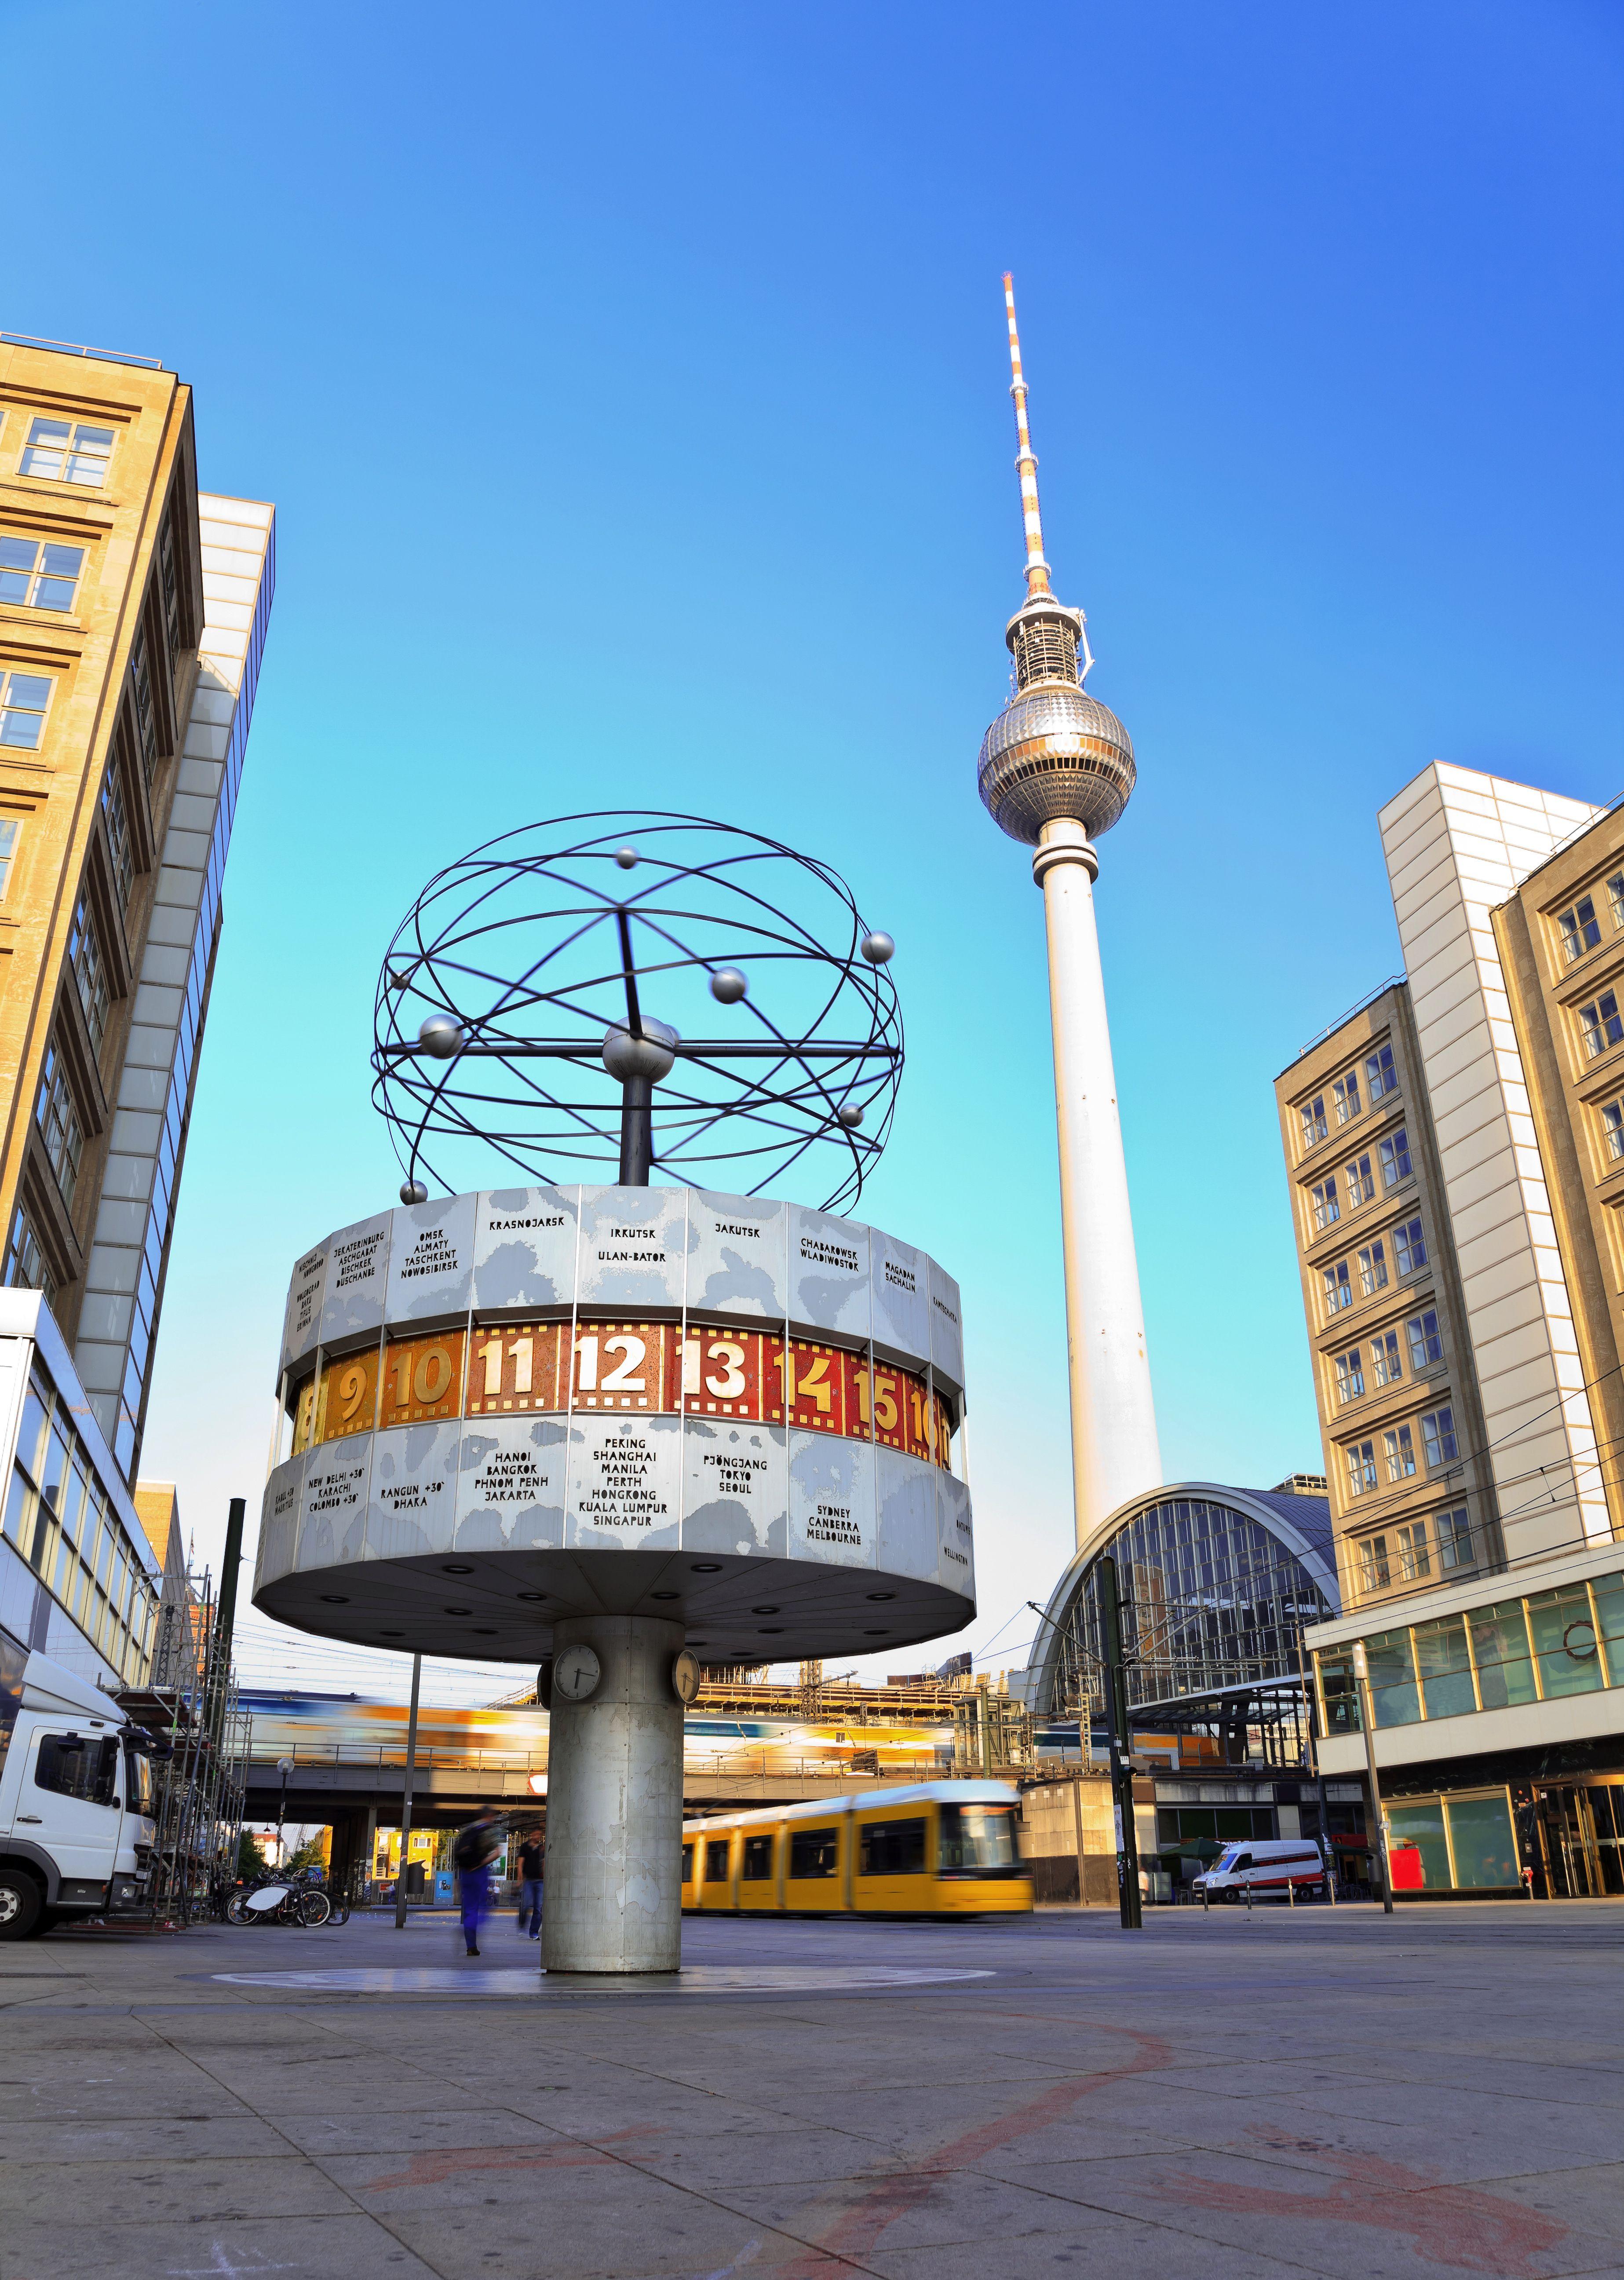 Stadtereisen Berlin Alexanderplatz Stadtereise Berlin Berlin Reisefuhrer Berlin